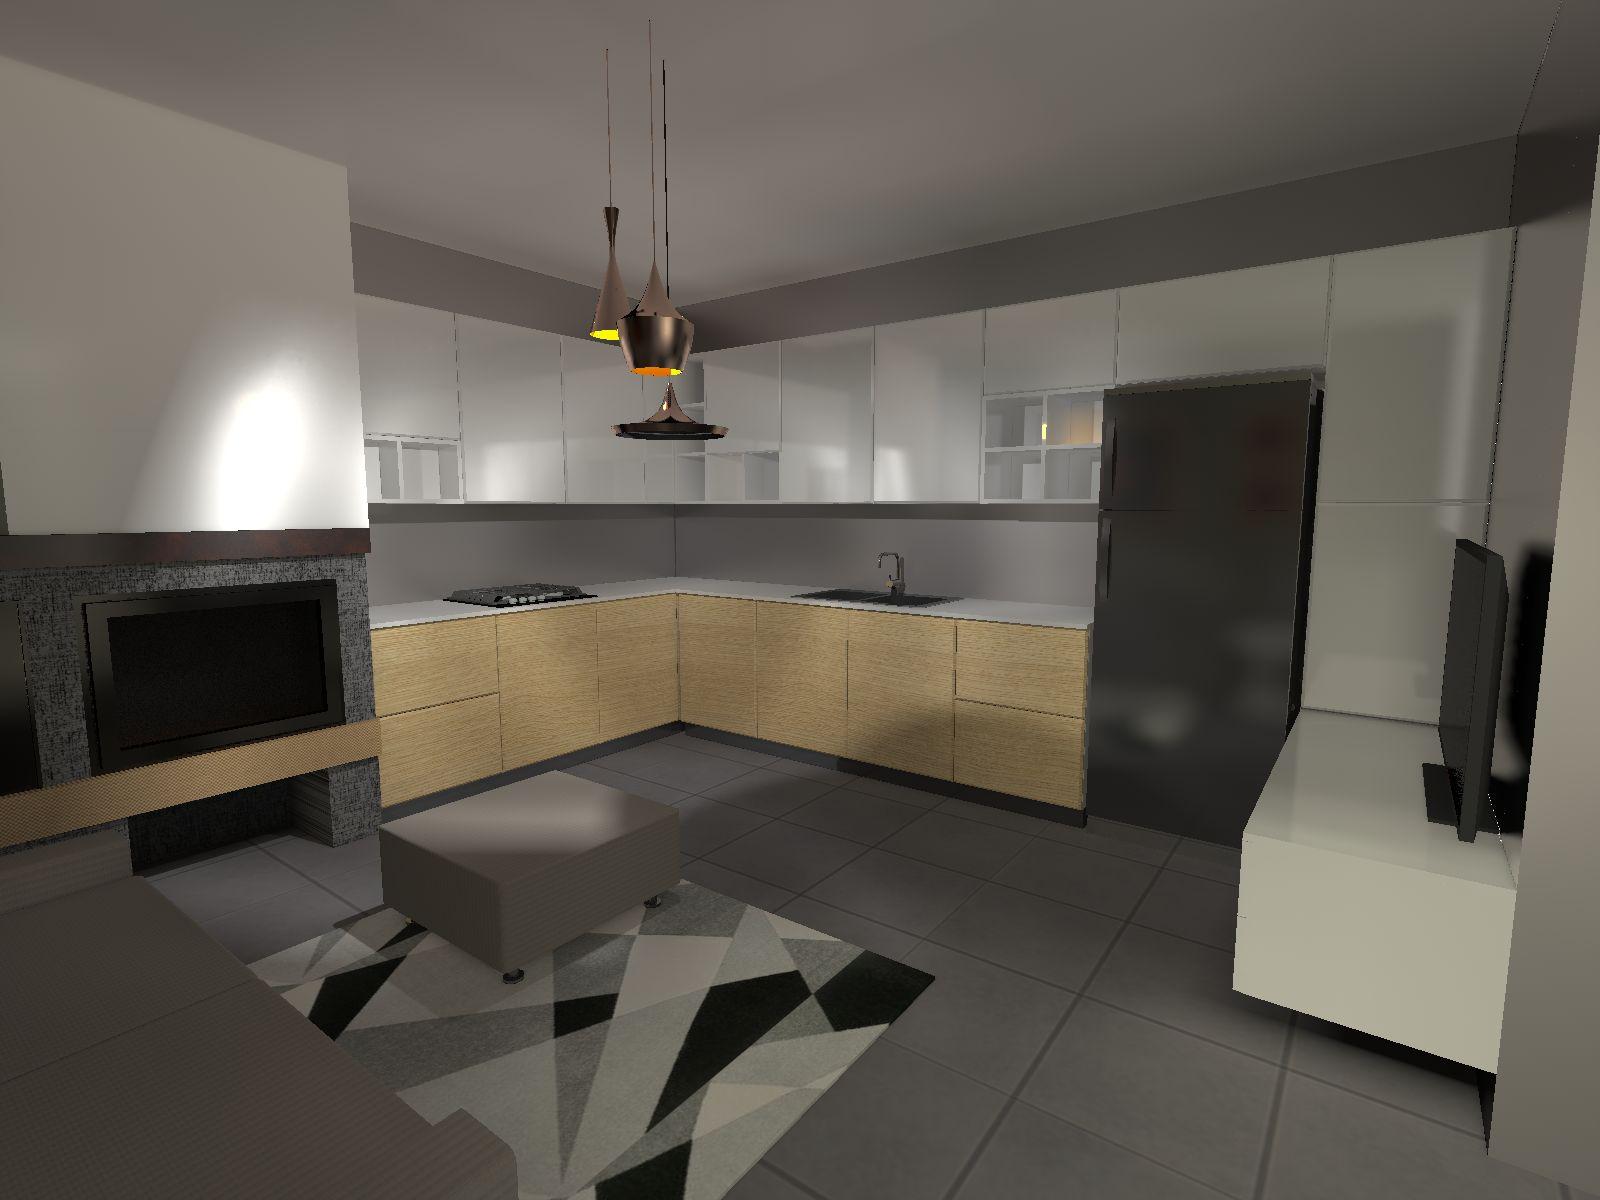 sogg-cucina-01